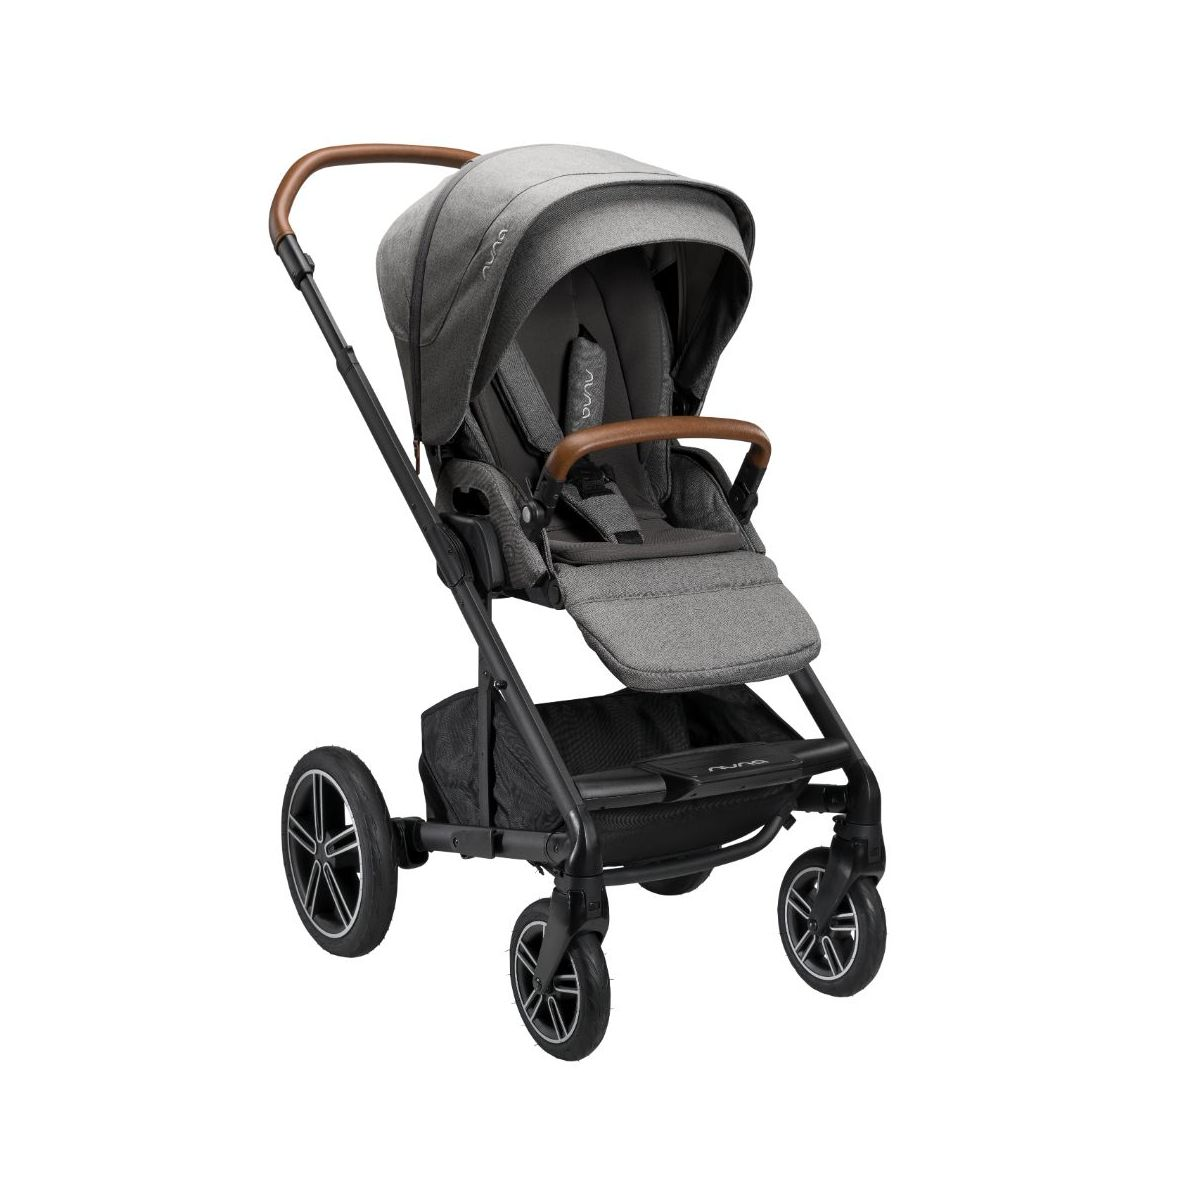 Nuna Mixx Next Stroller-Granite (New)